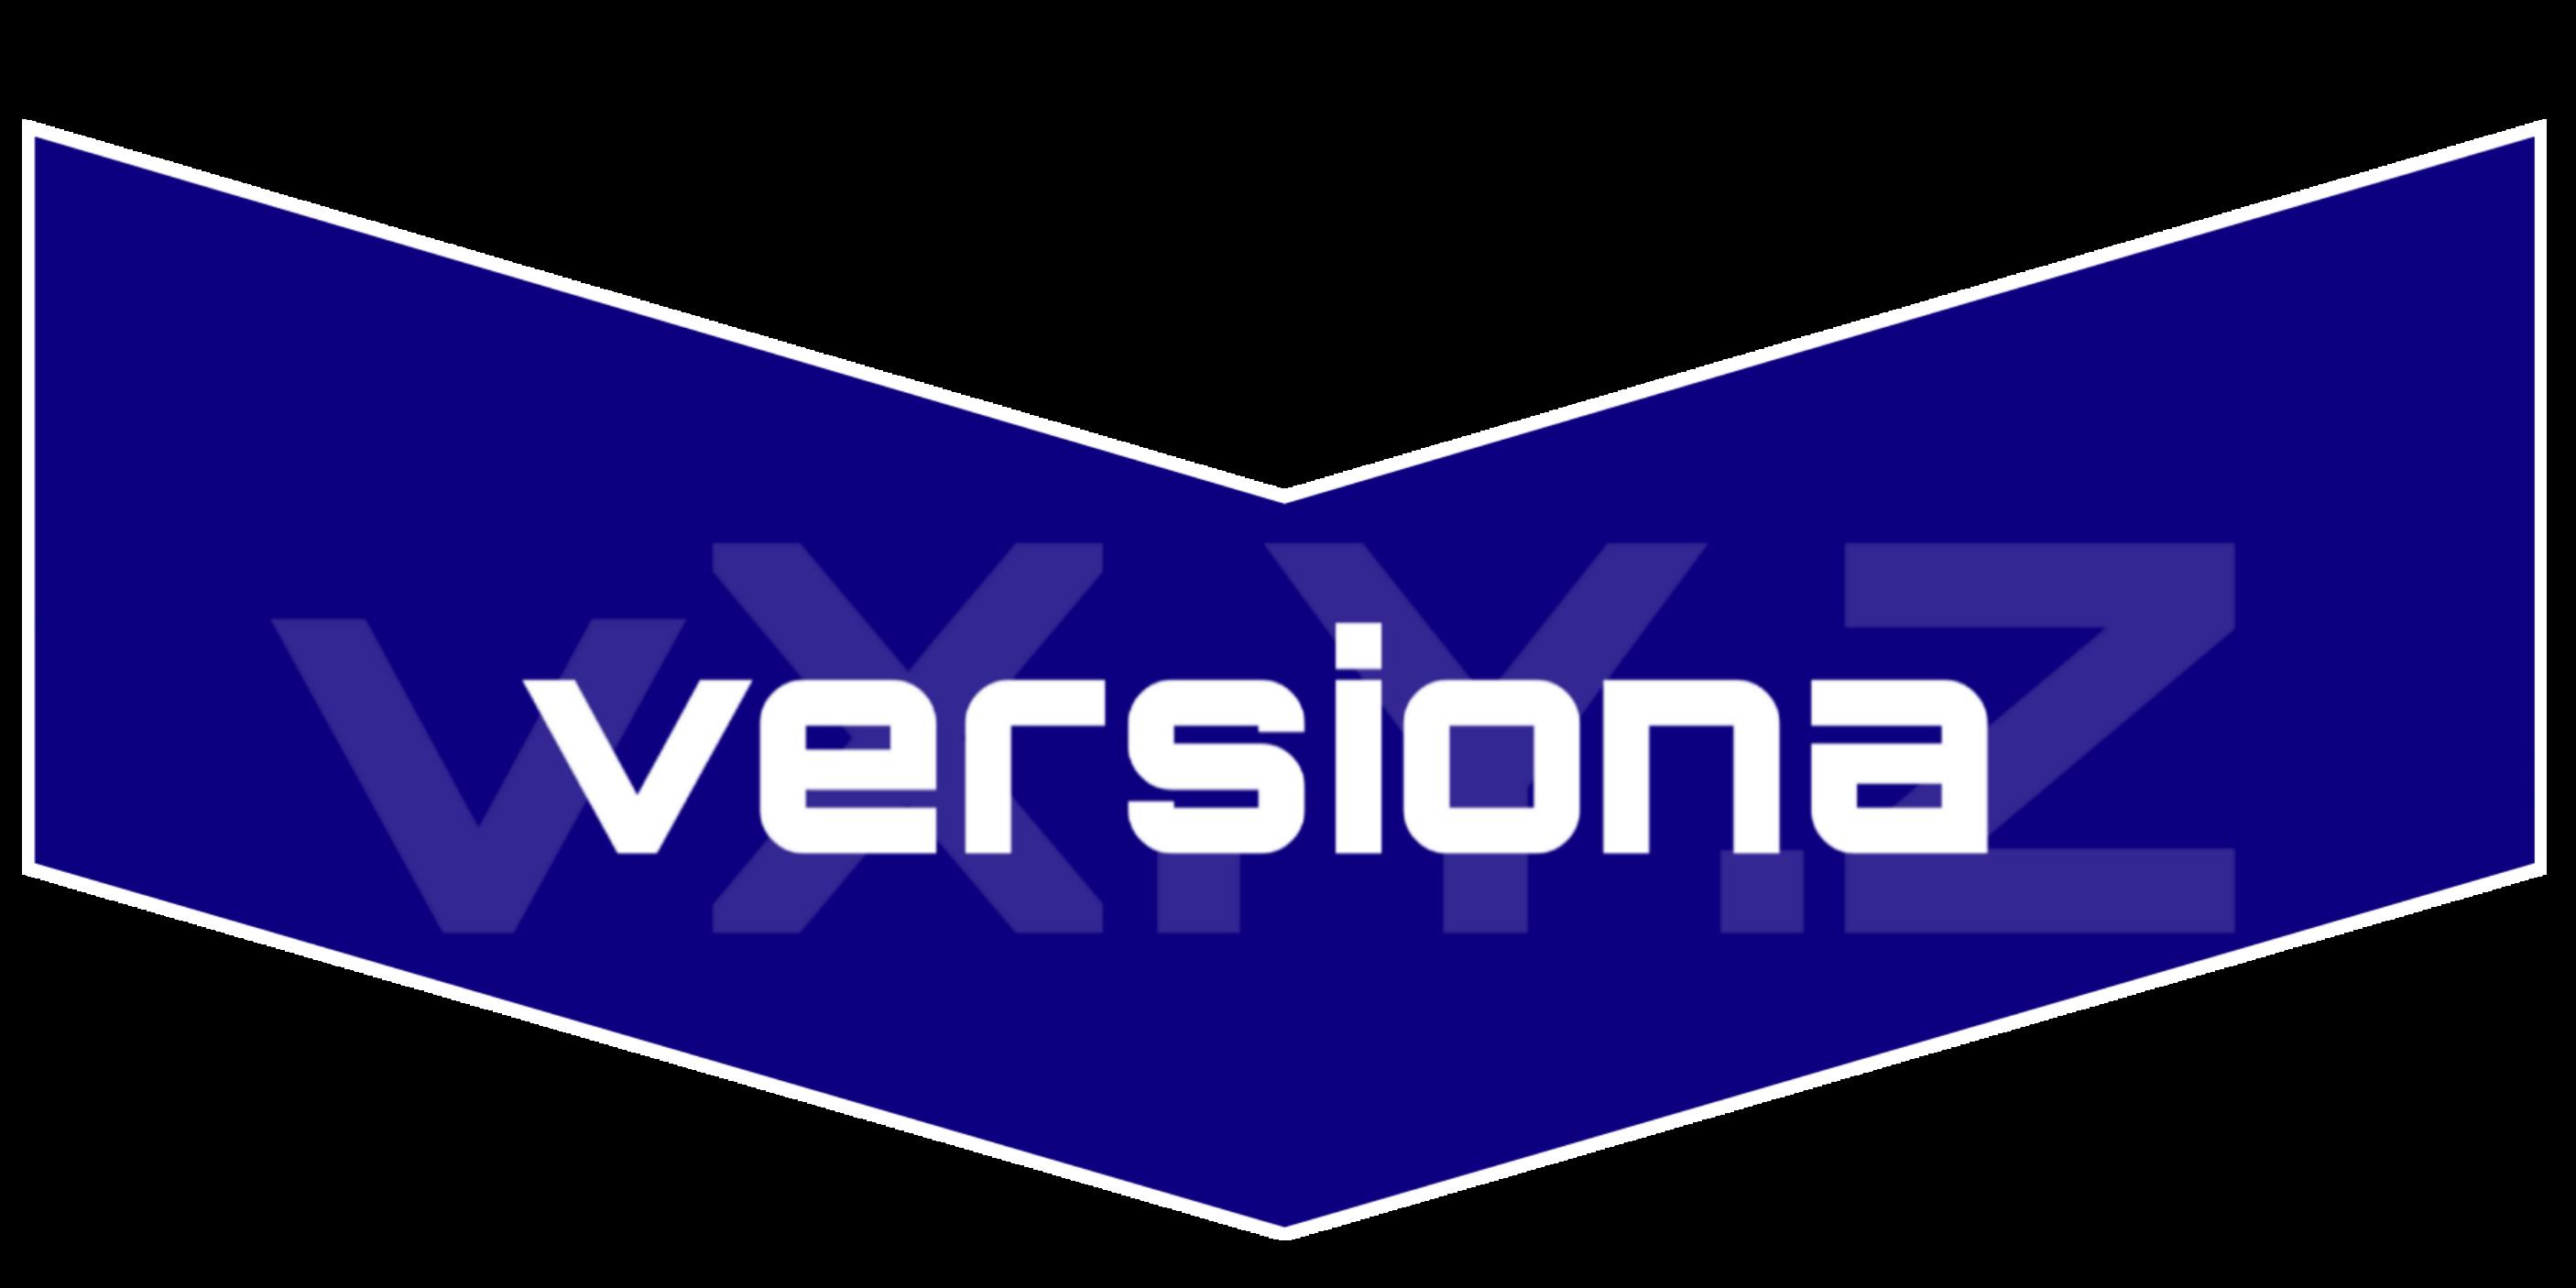 versiona logo